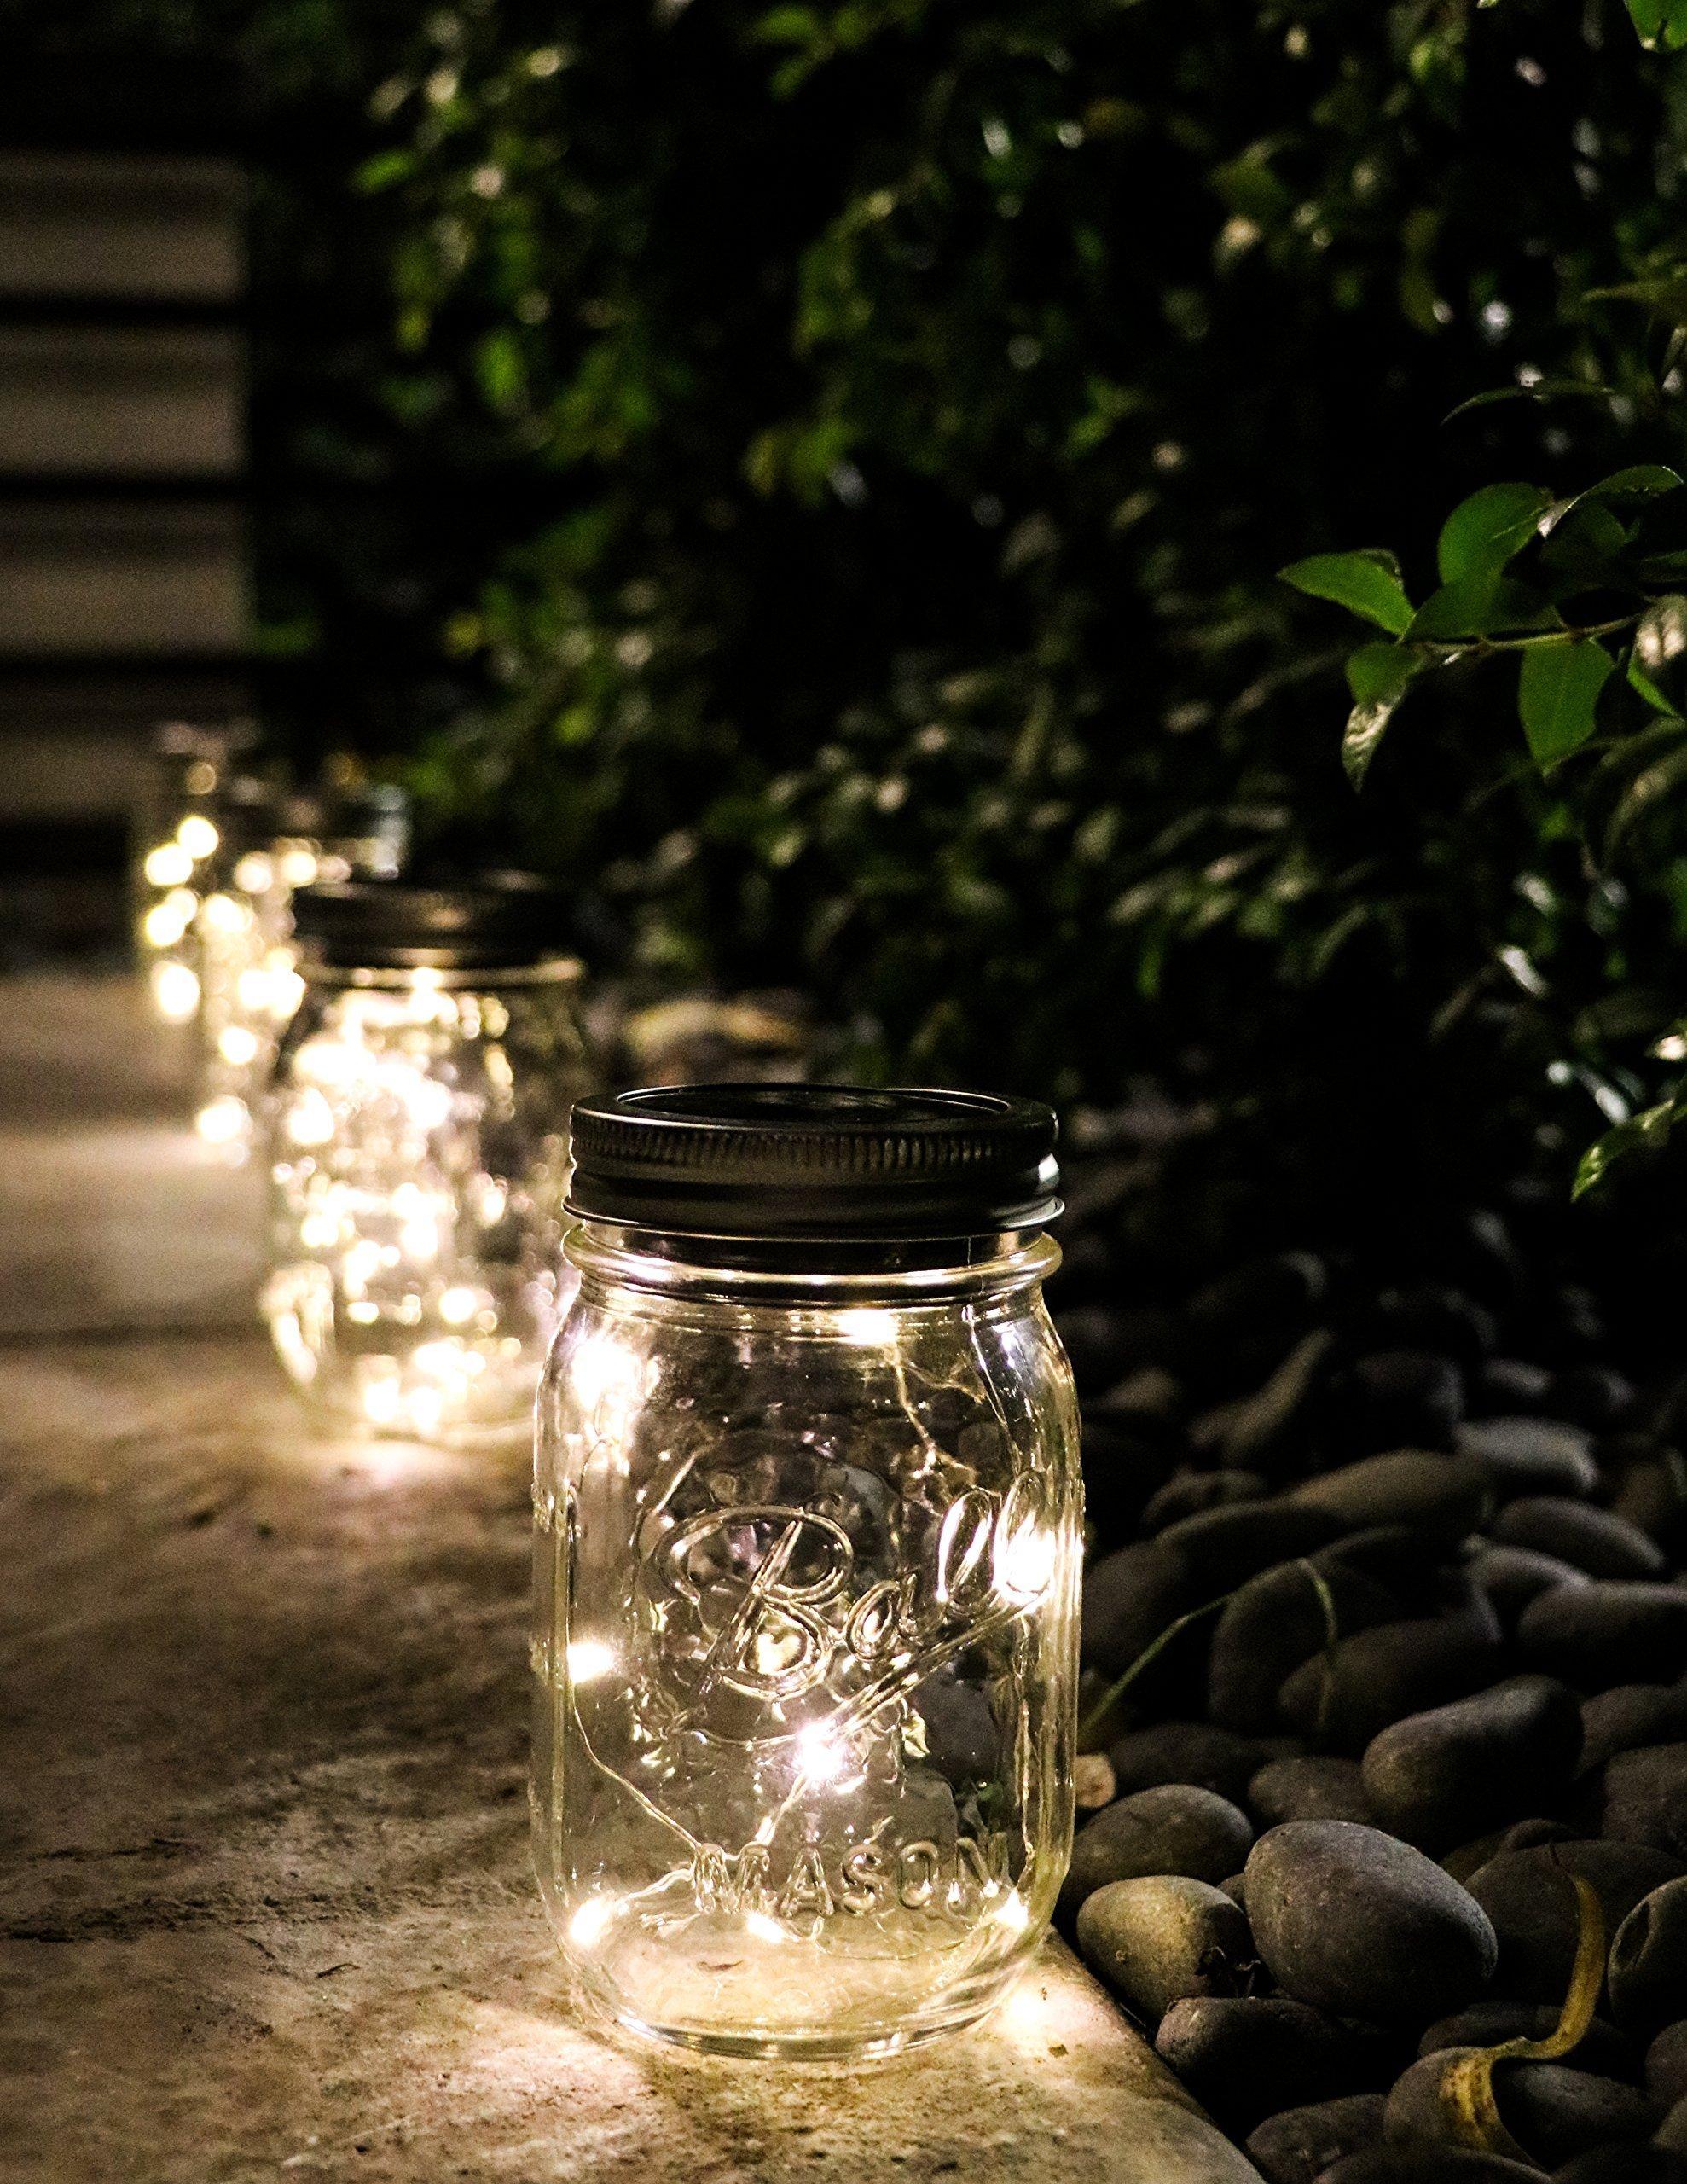 6 Pack -Solar Mason Jar Insert Lids - LED Mason Jar string light for Glass Mason Jars - Solar Pathway Garden Lights for all occasion parties -Jar Hangers Included Qty -6